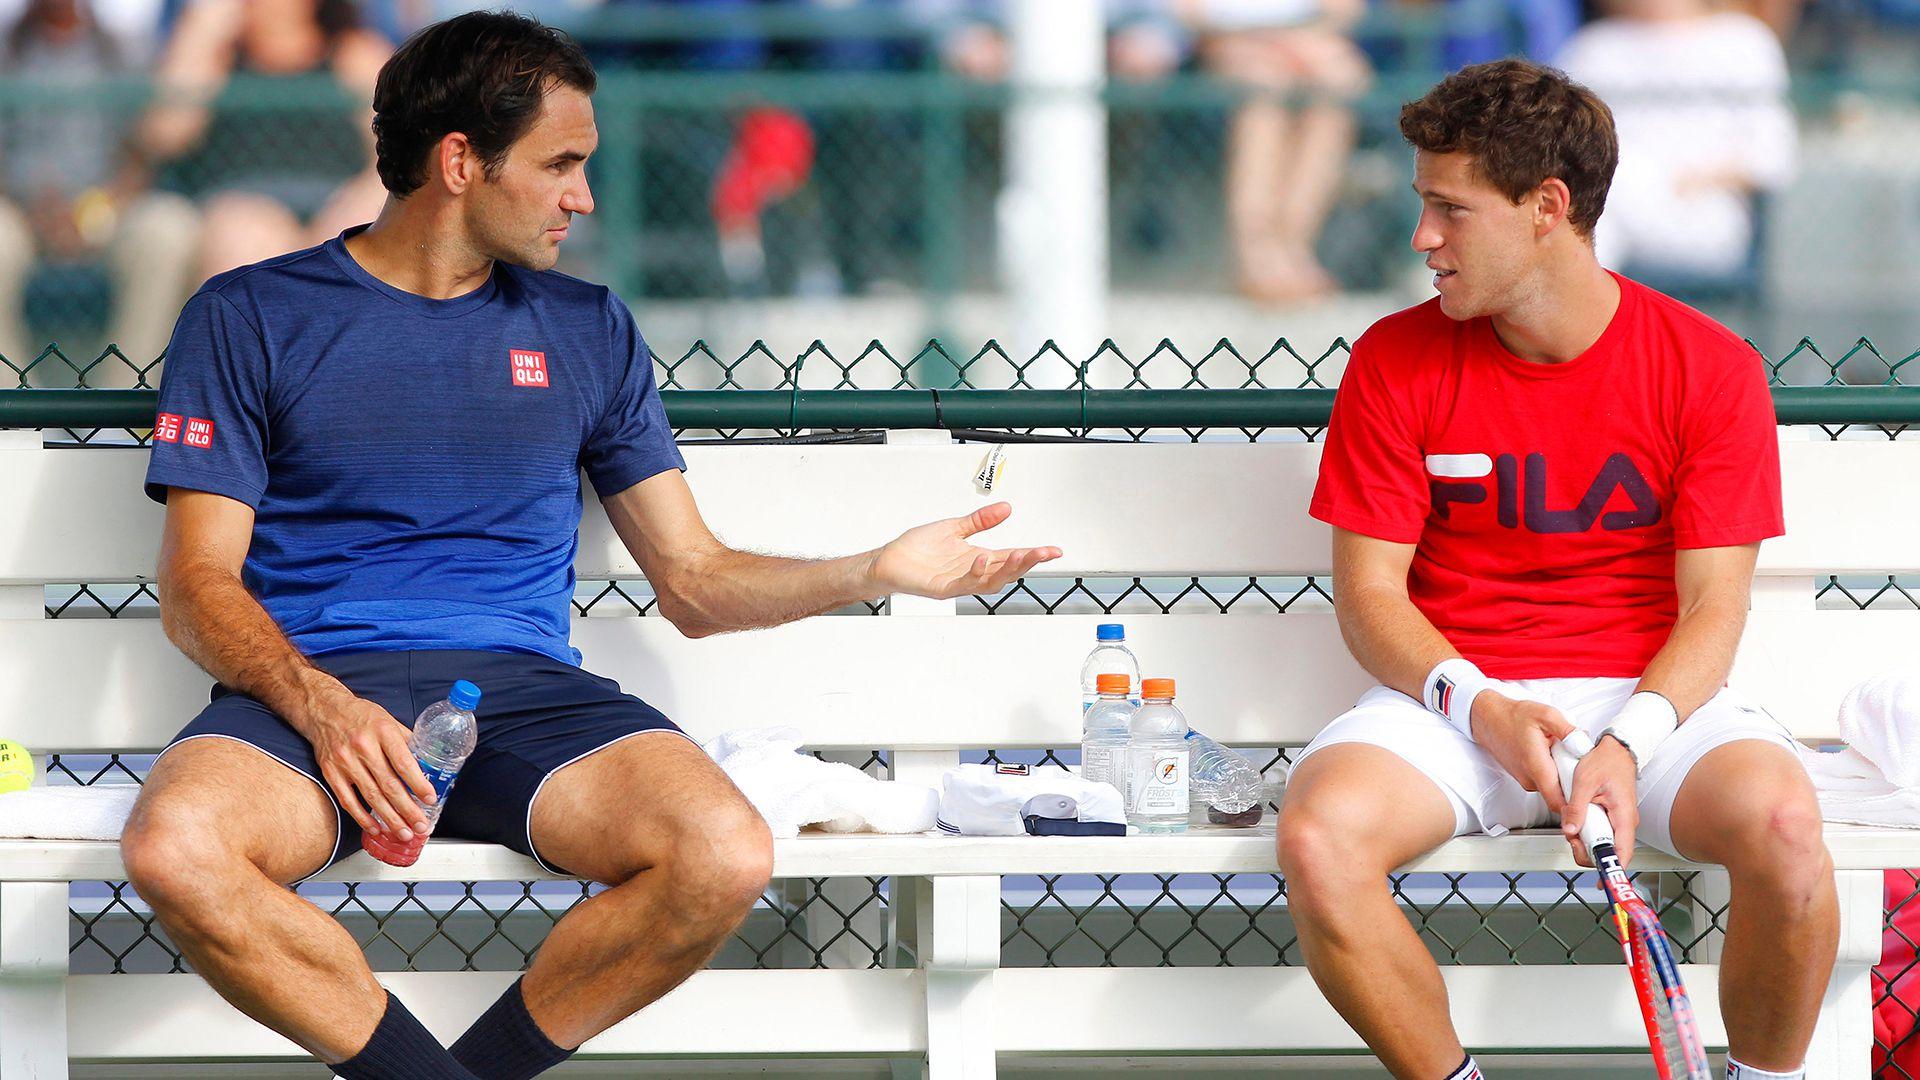 Federer y el Peque, juntos en Indian Wells 2019 (Ella Ling/BPI/Shutterstock)